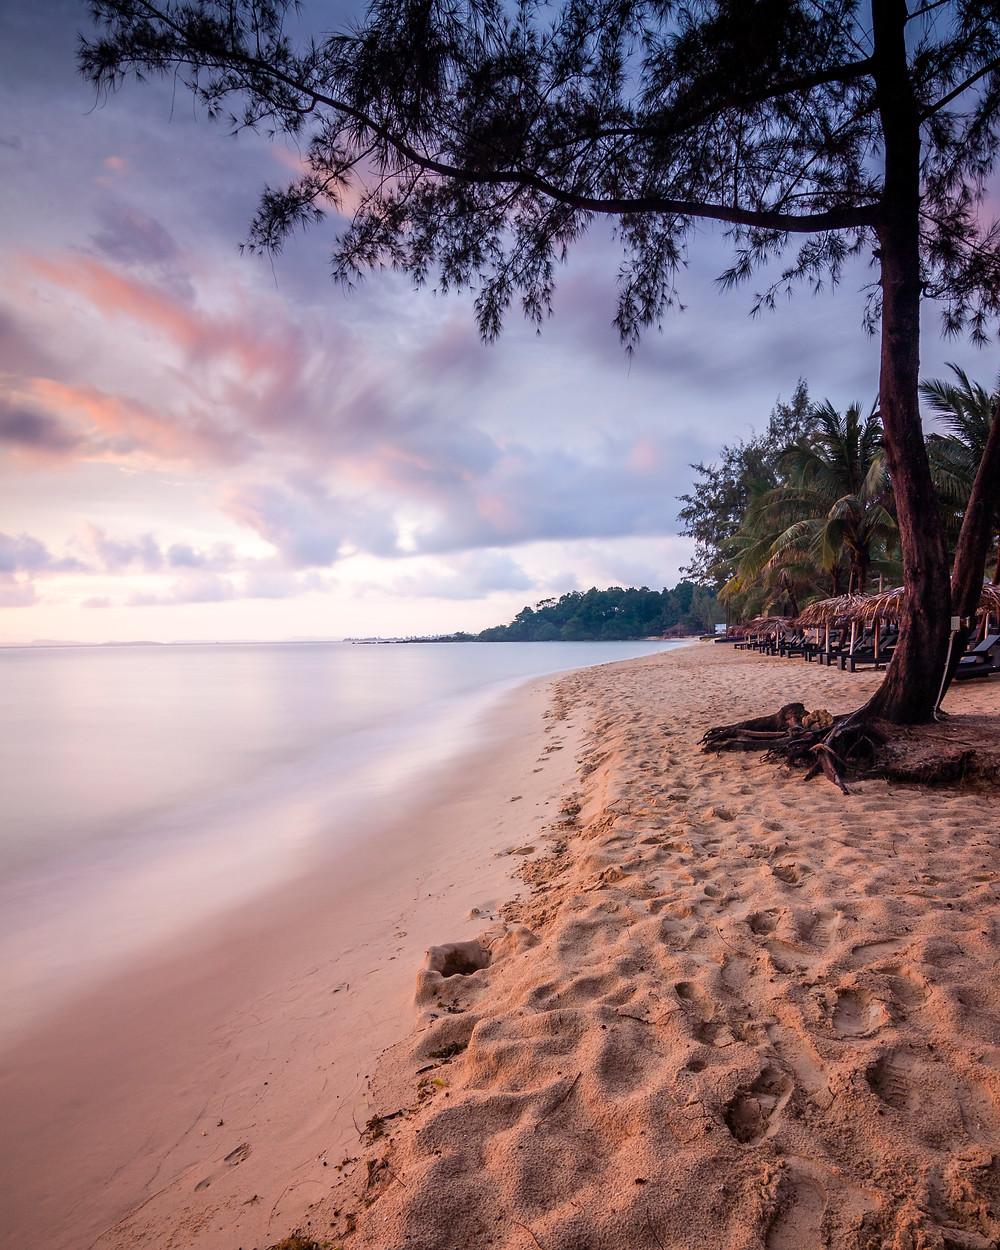 Sunset at Otres Beach, Sihanoukville, Cambodia